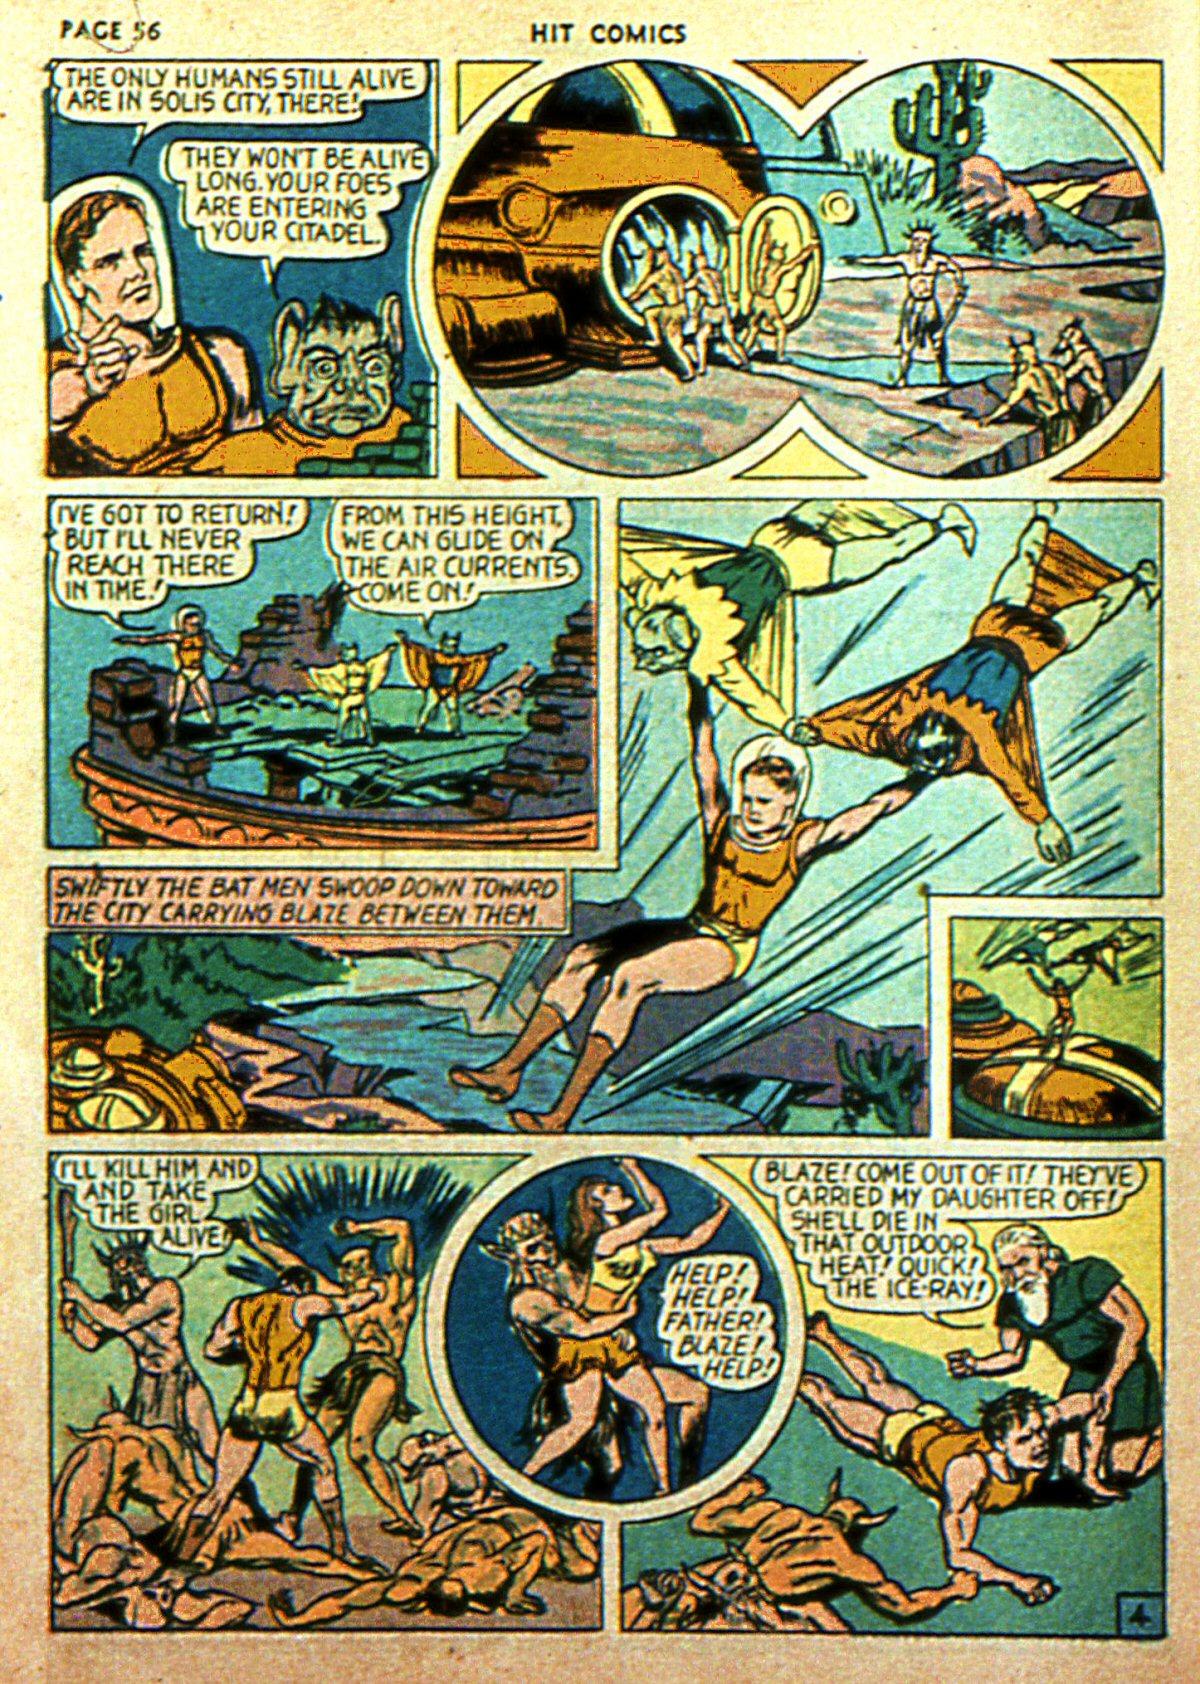 Read online Hit Comics comic -  Issue #2 - 58